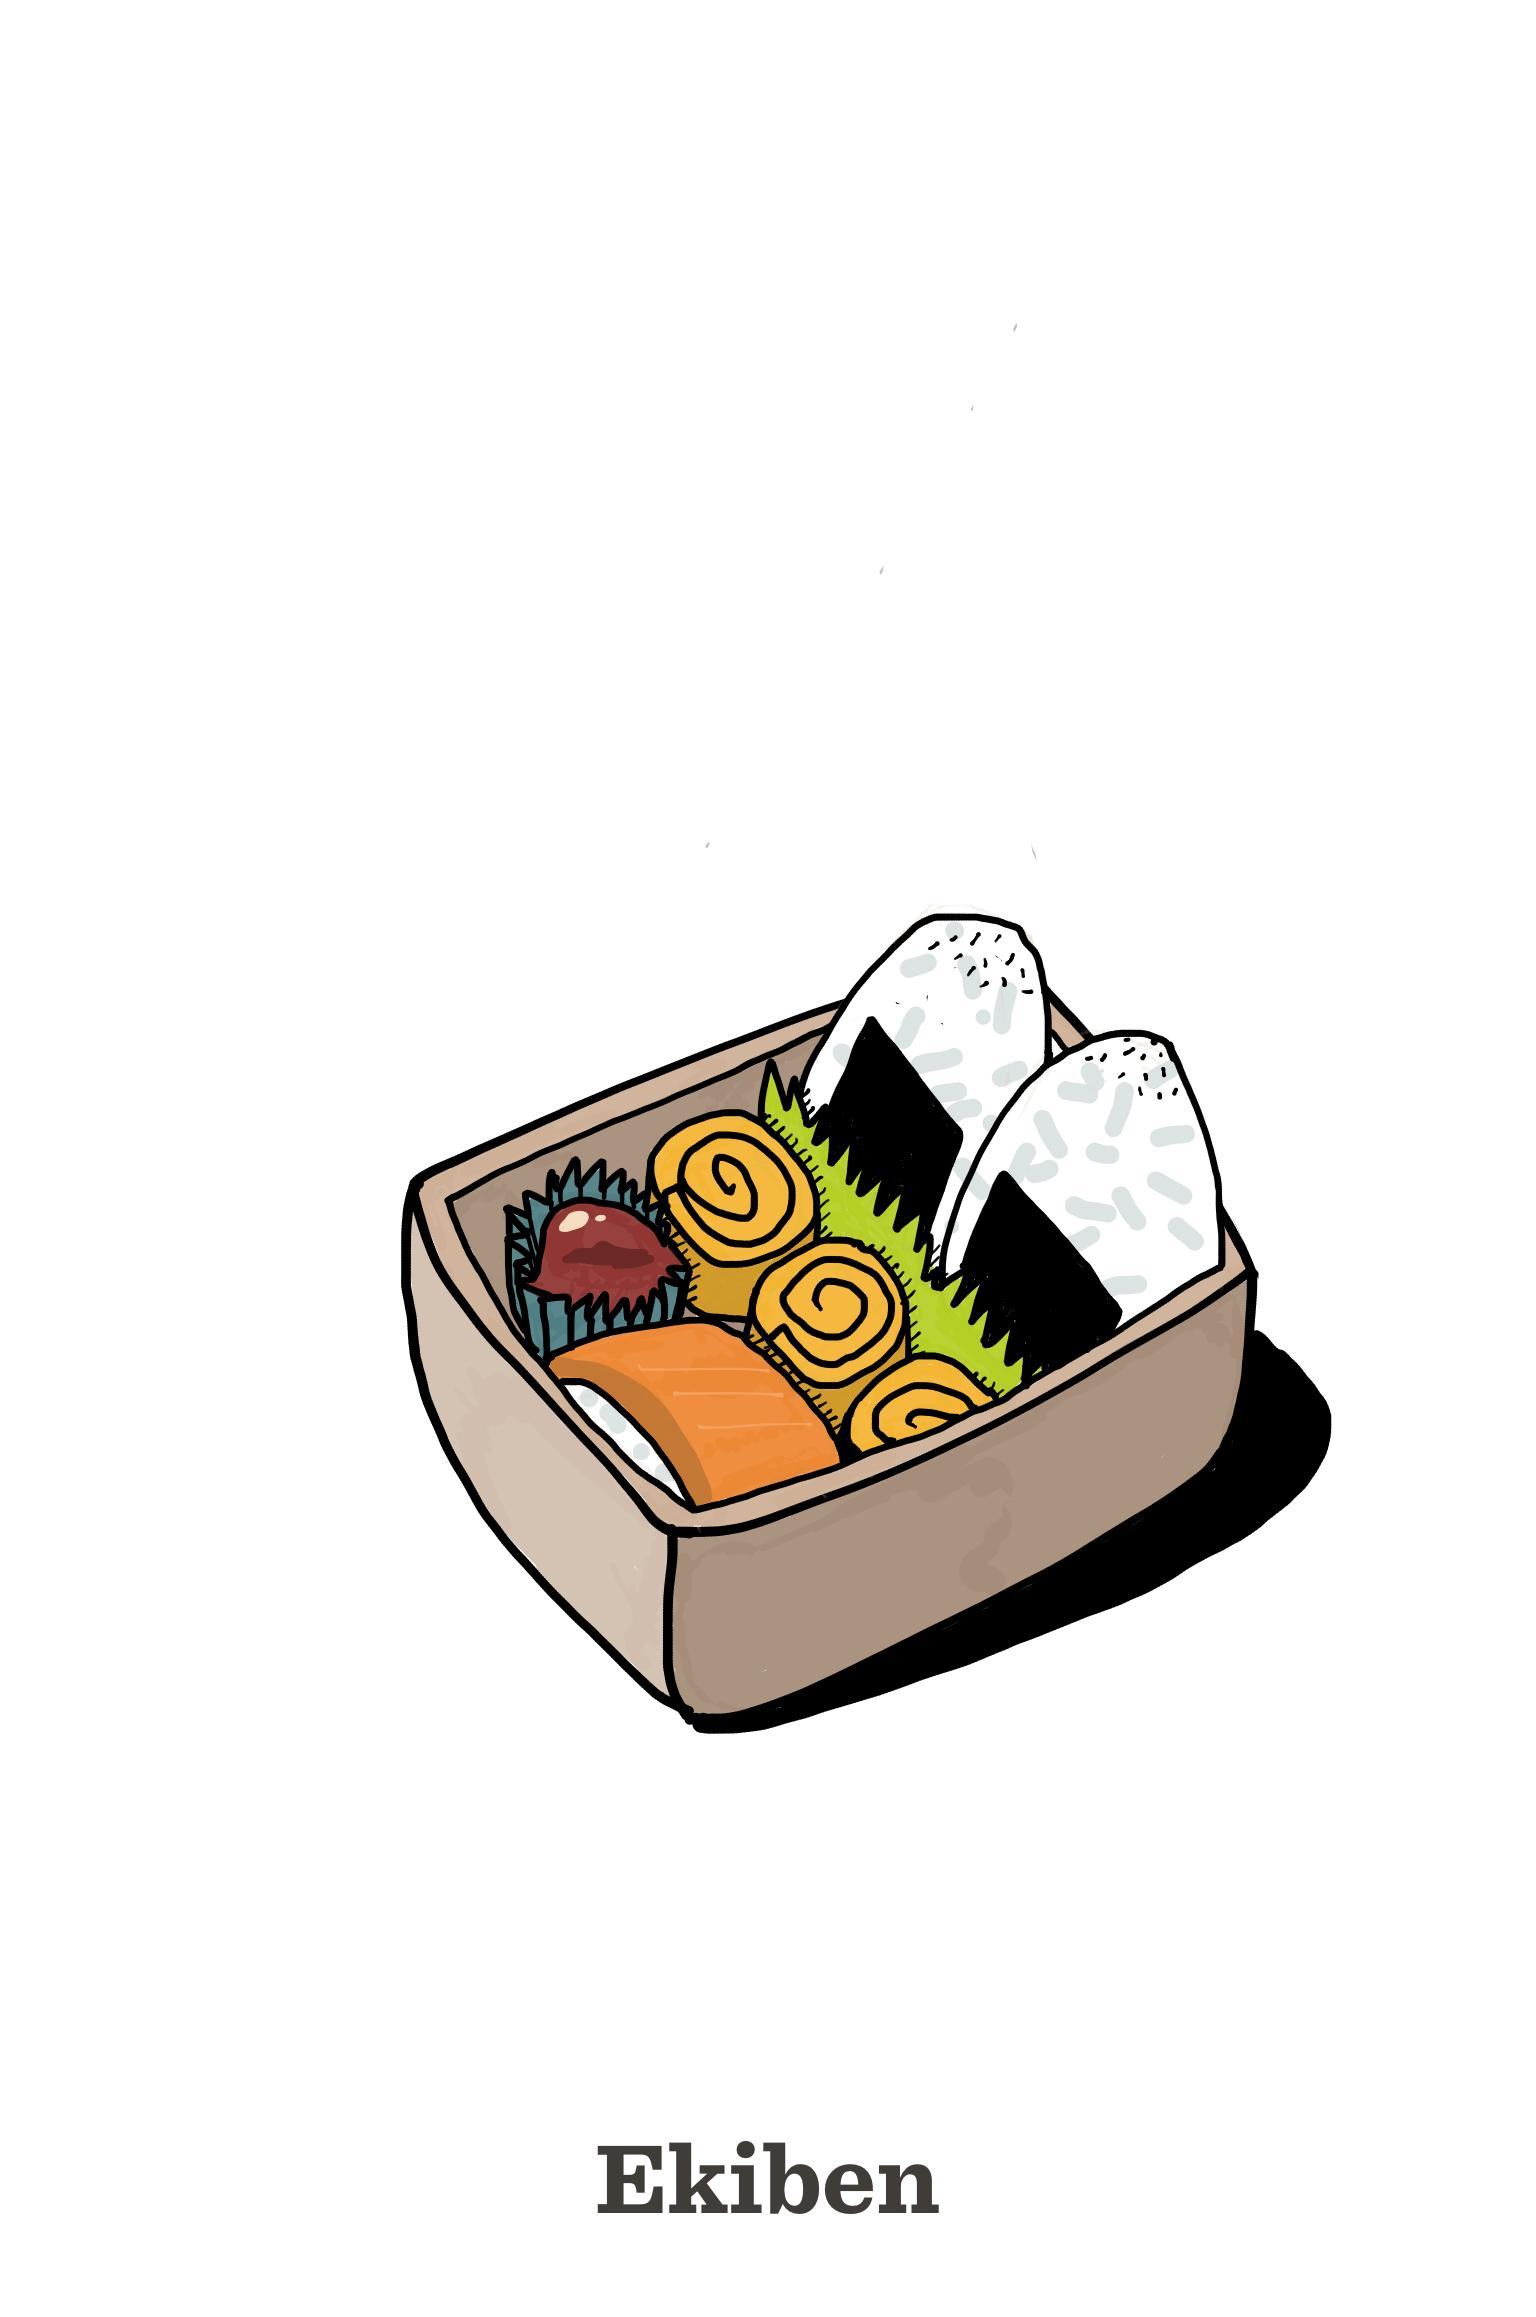 3-ekiben-the-sushi-game